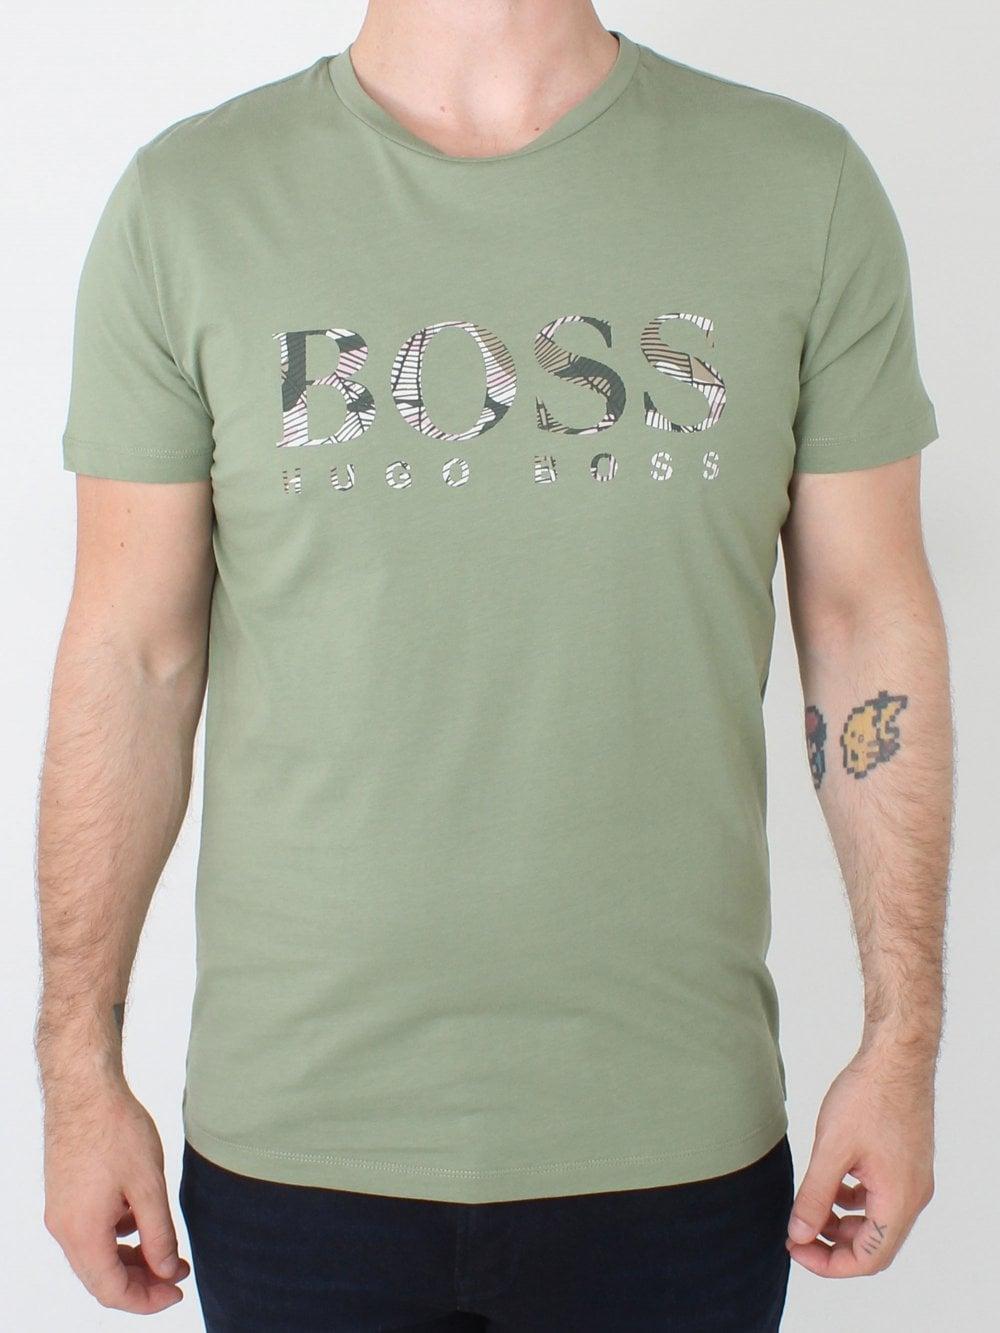 00e0e024e Hugo Boss Tauno 7 T-Shirt in Pastel Green   Northern Threads